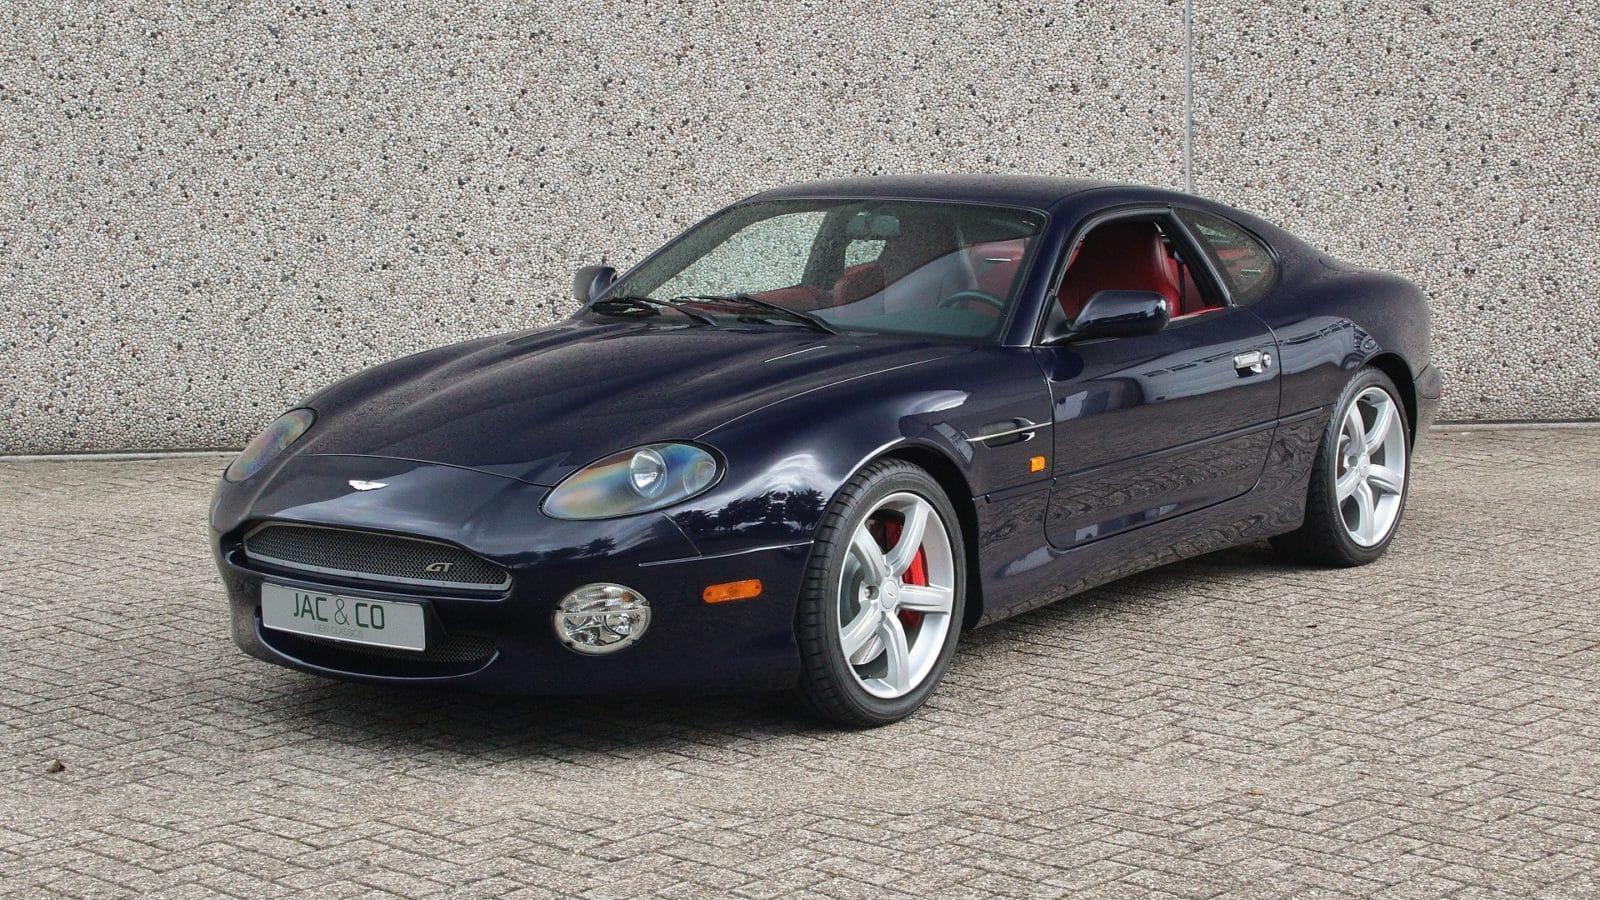 Aston Martin Db7 Gt Jac Co